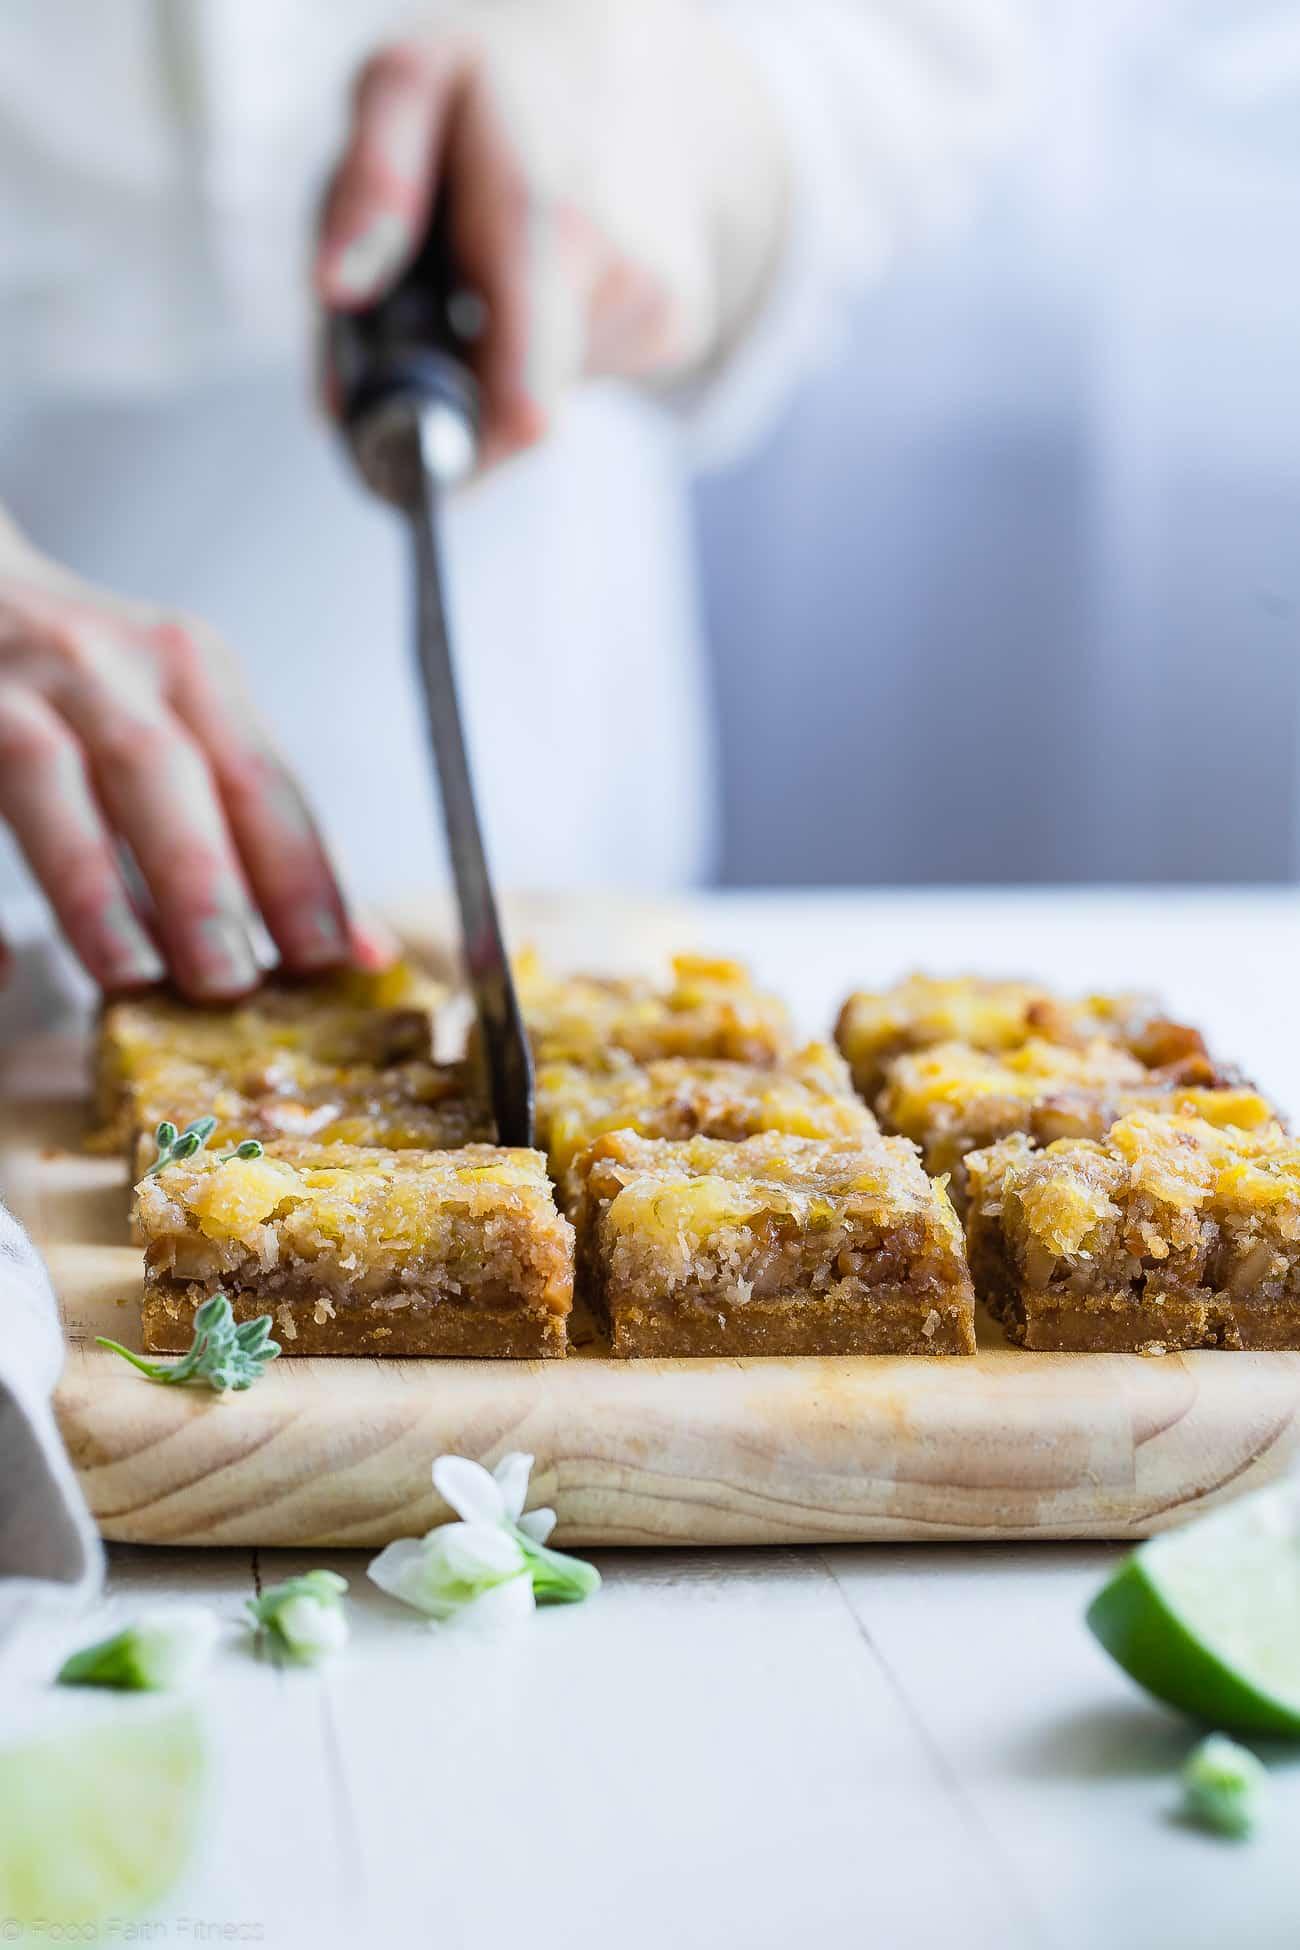 cutting tropical paleo magic cookie bars. Recipe on foodfaithfitness.com